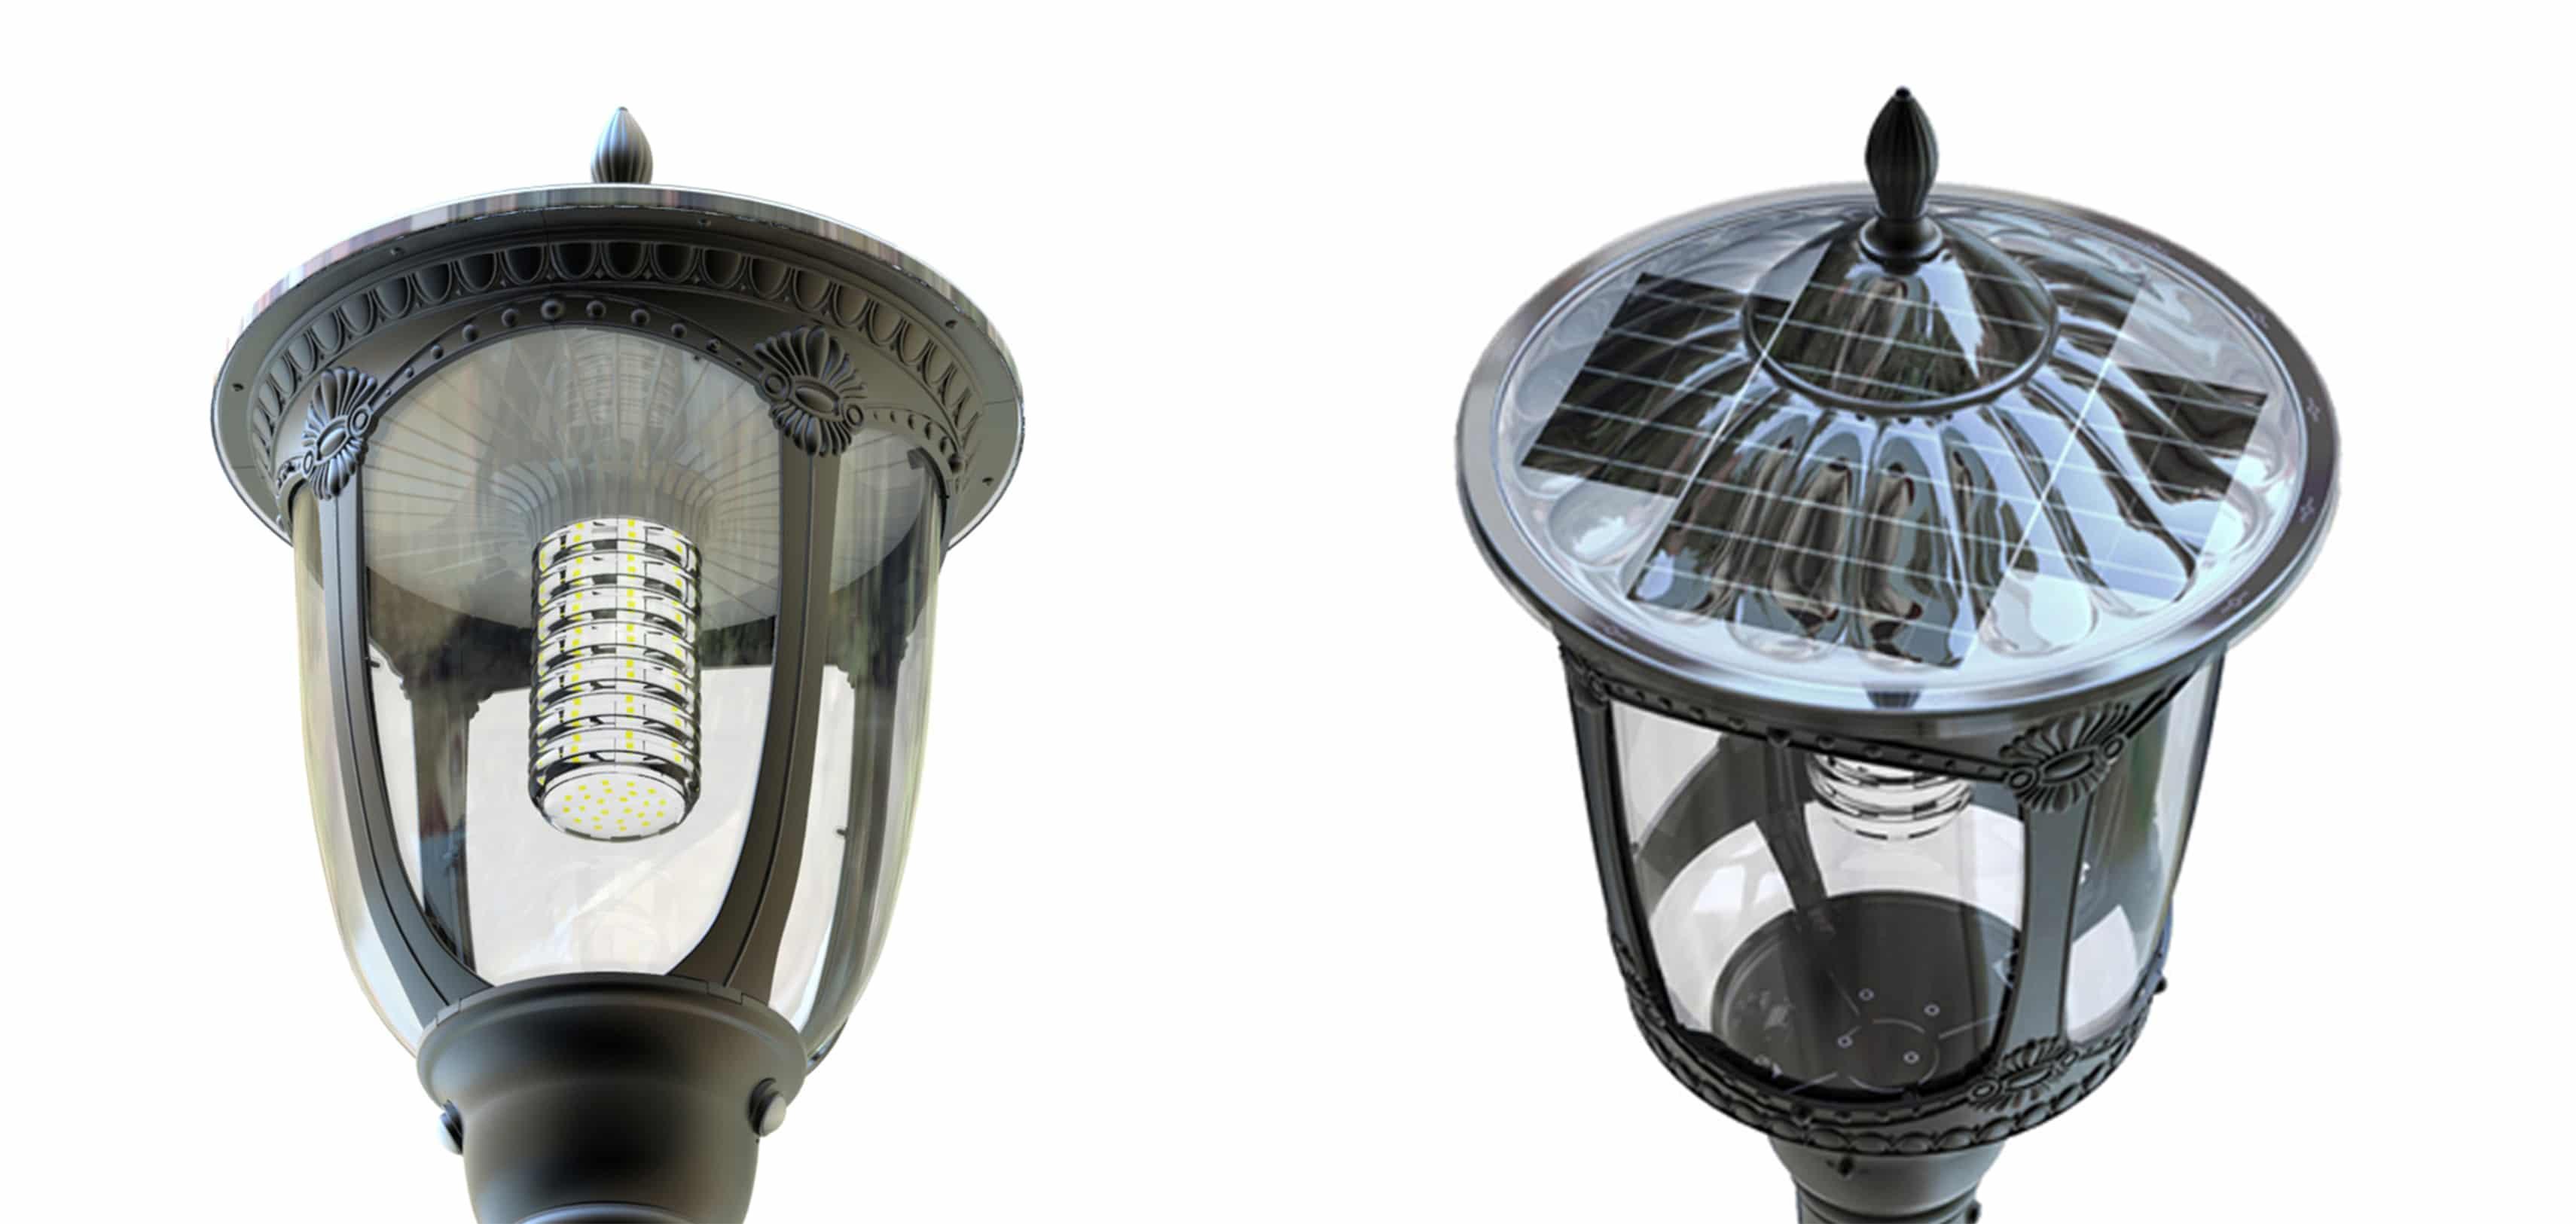 Solarna latarnia trójramienna